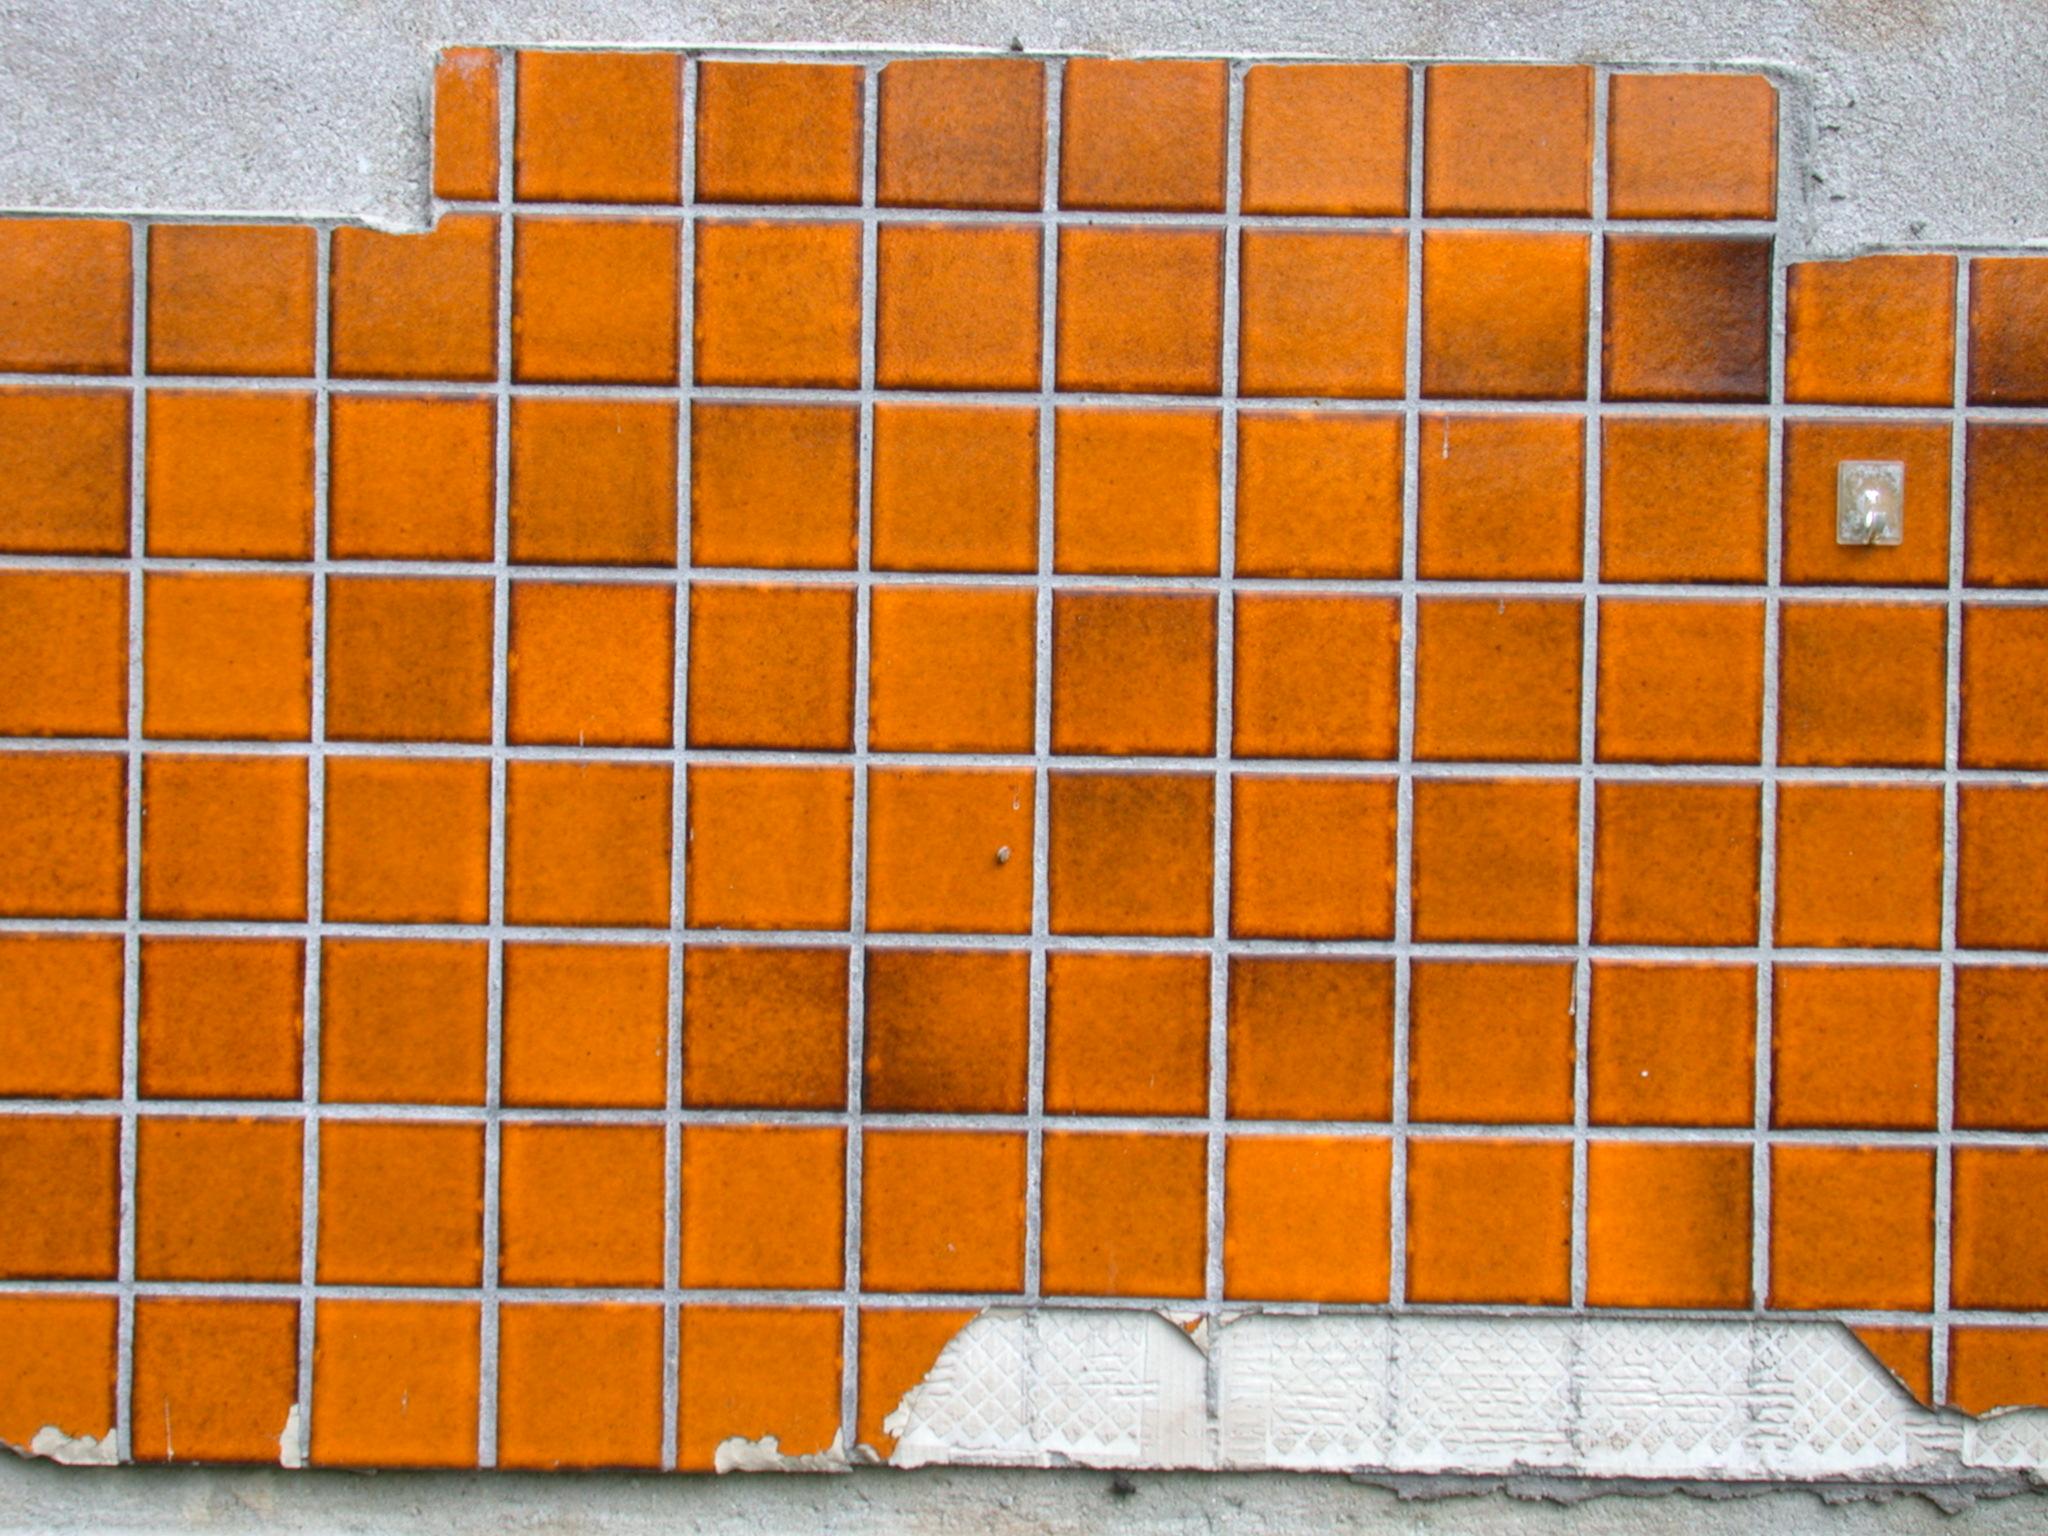 tile tiles wall texture broken pattern ceramic